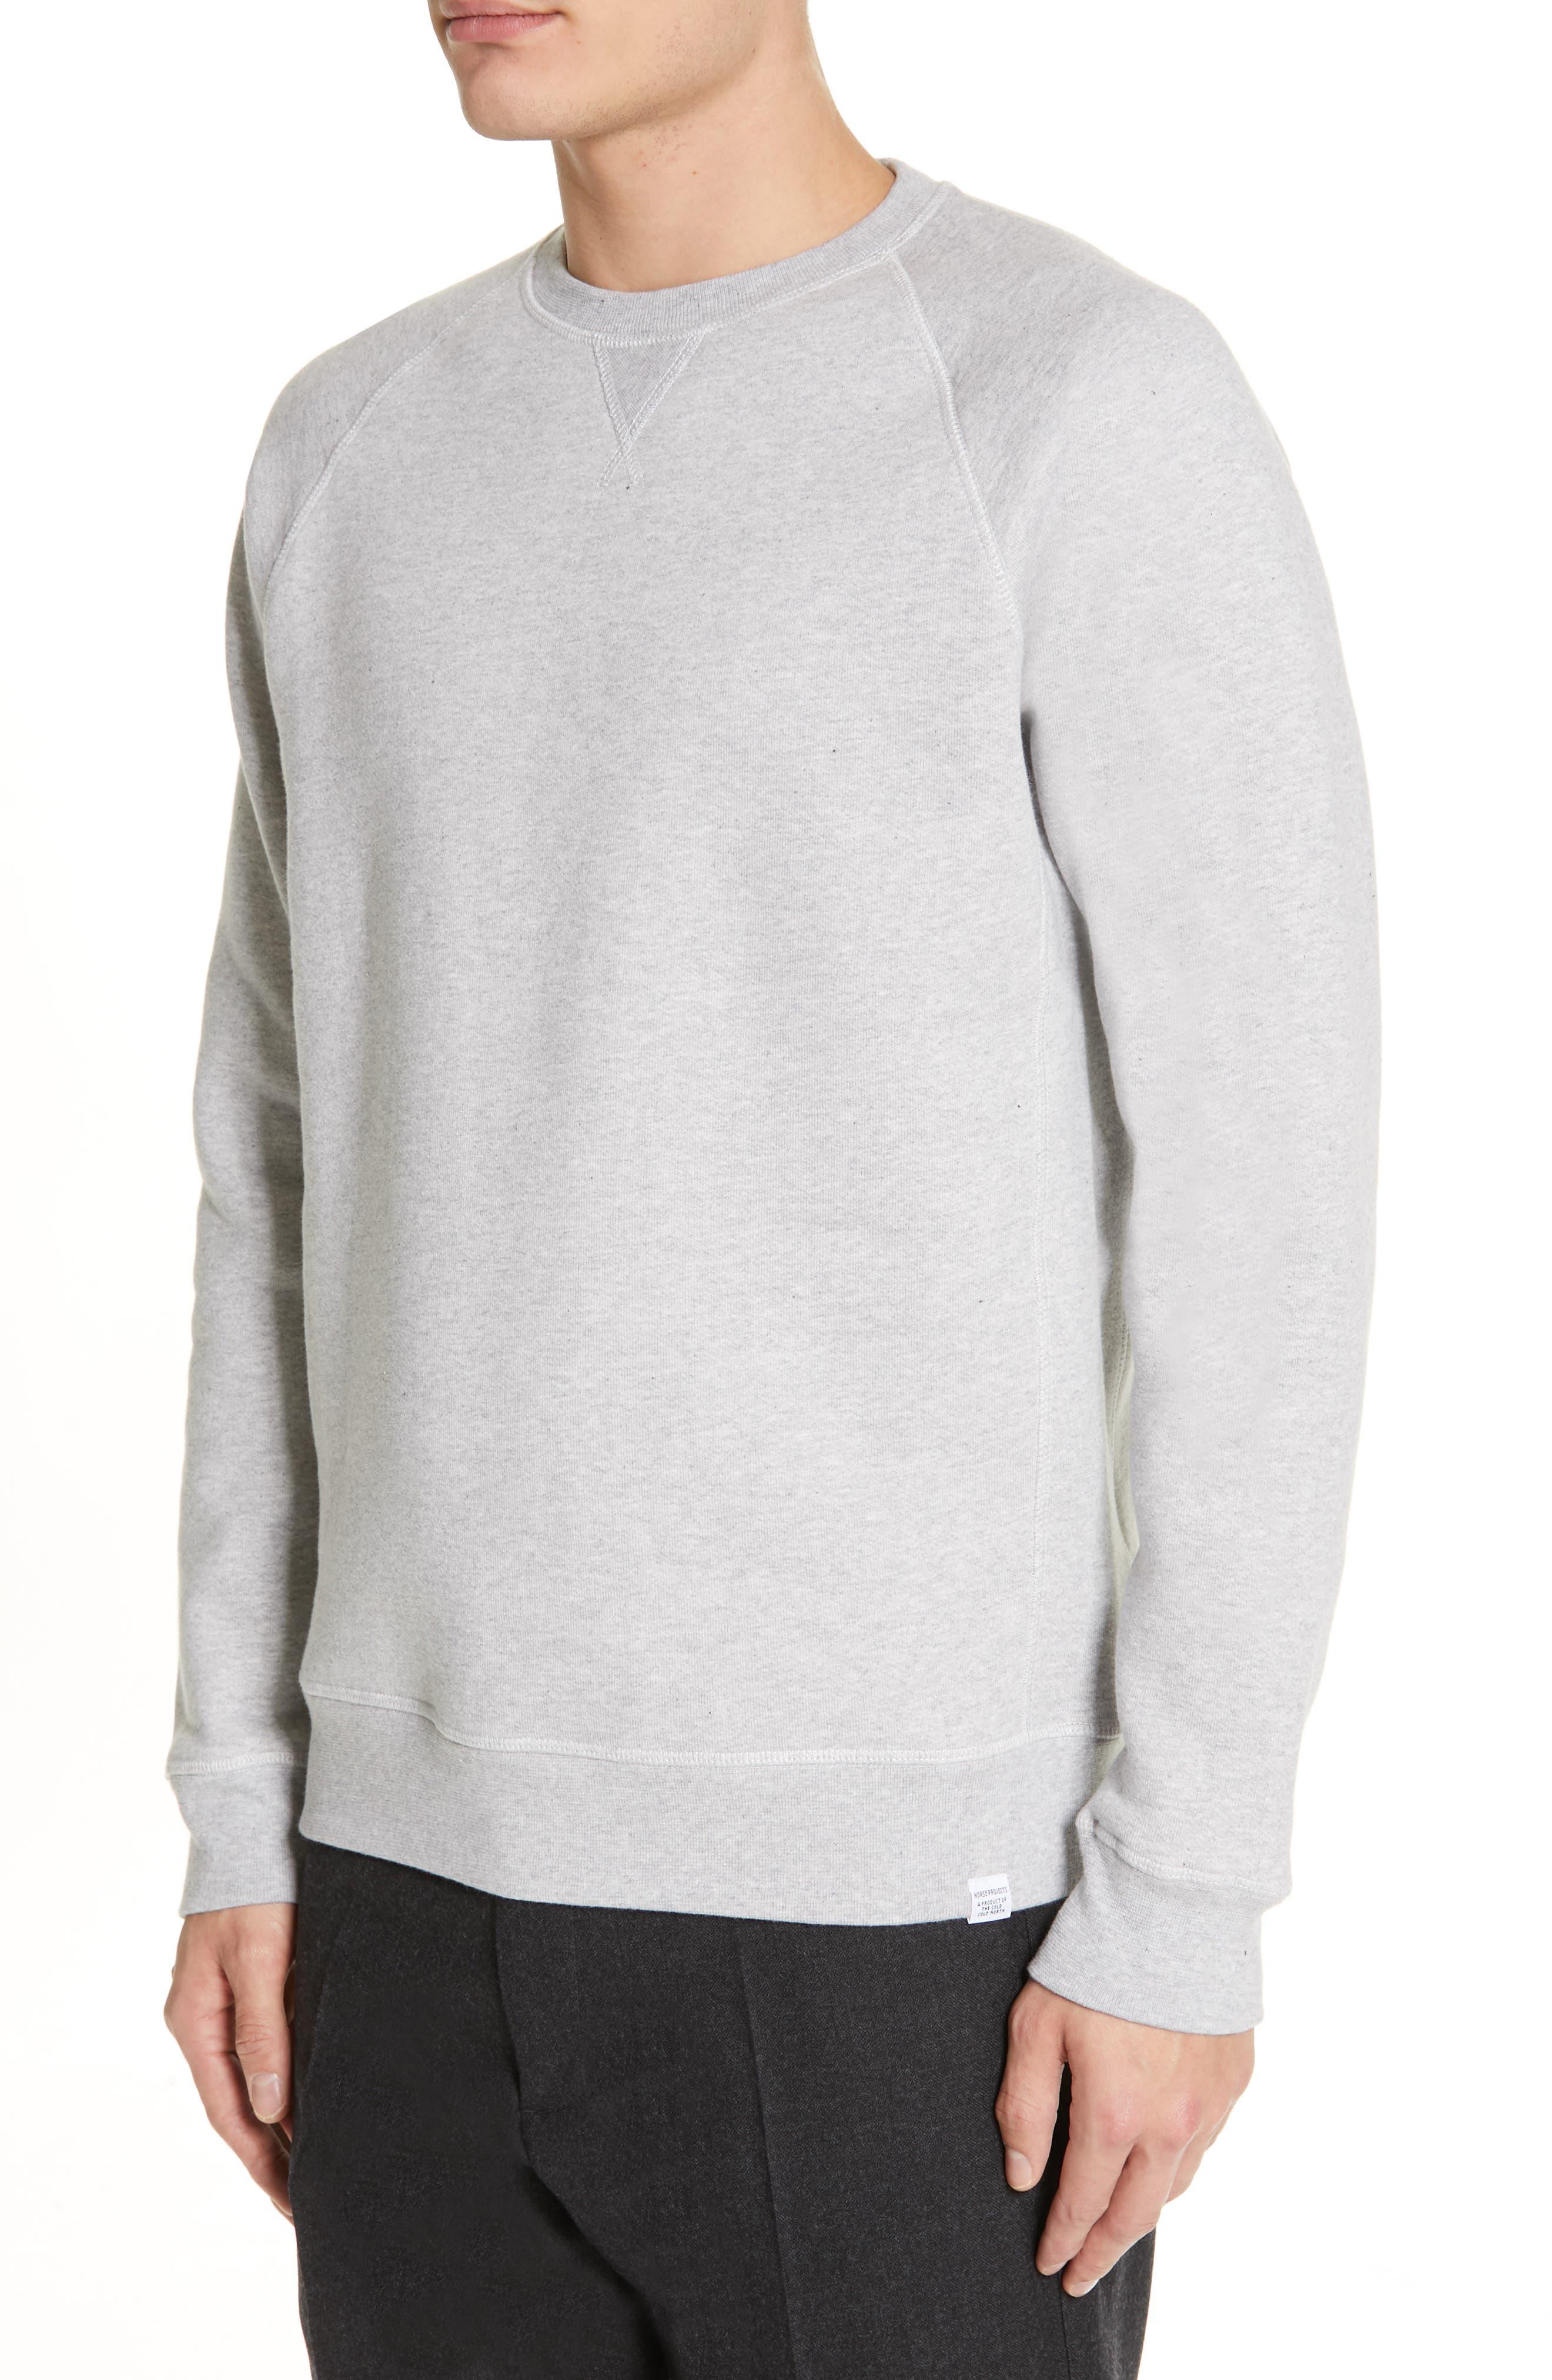 NORSE PROJECTS, Ketel Raglan Sweatshirt, Alternate thumbnail 4, color, LIGHT GREY MELANGE